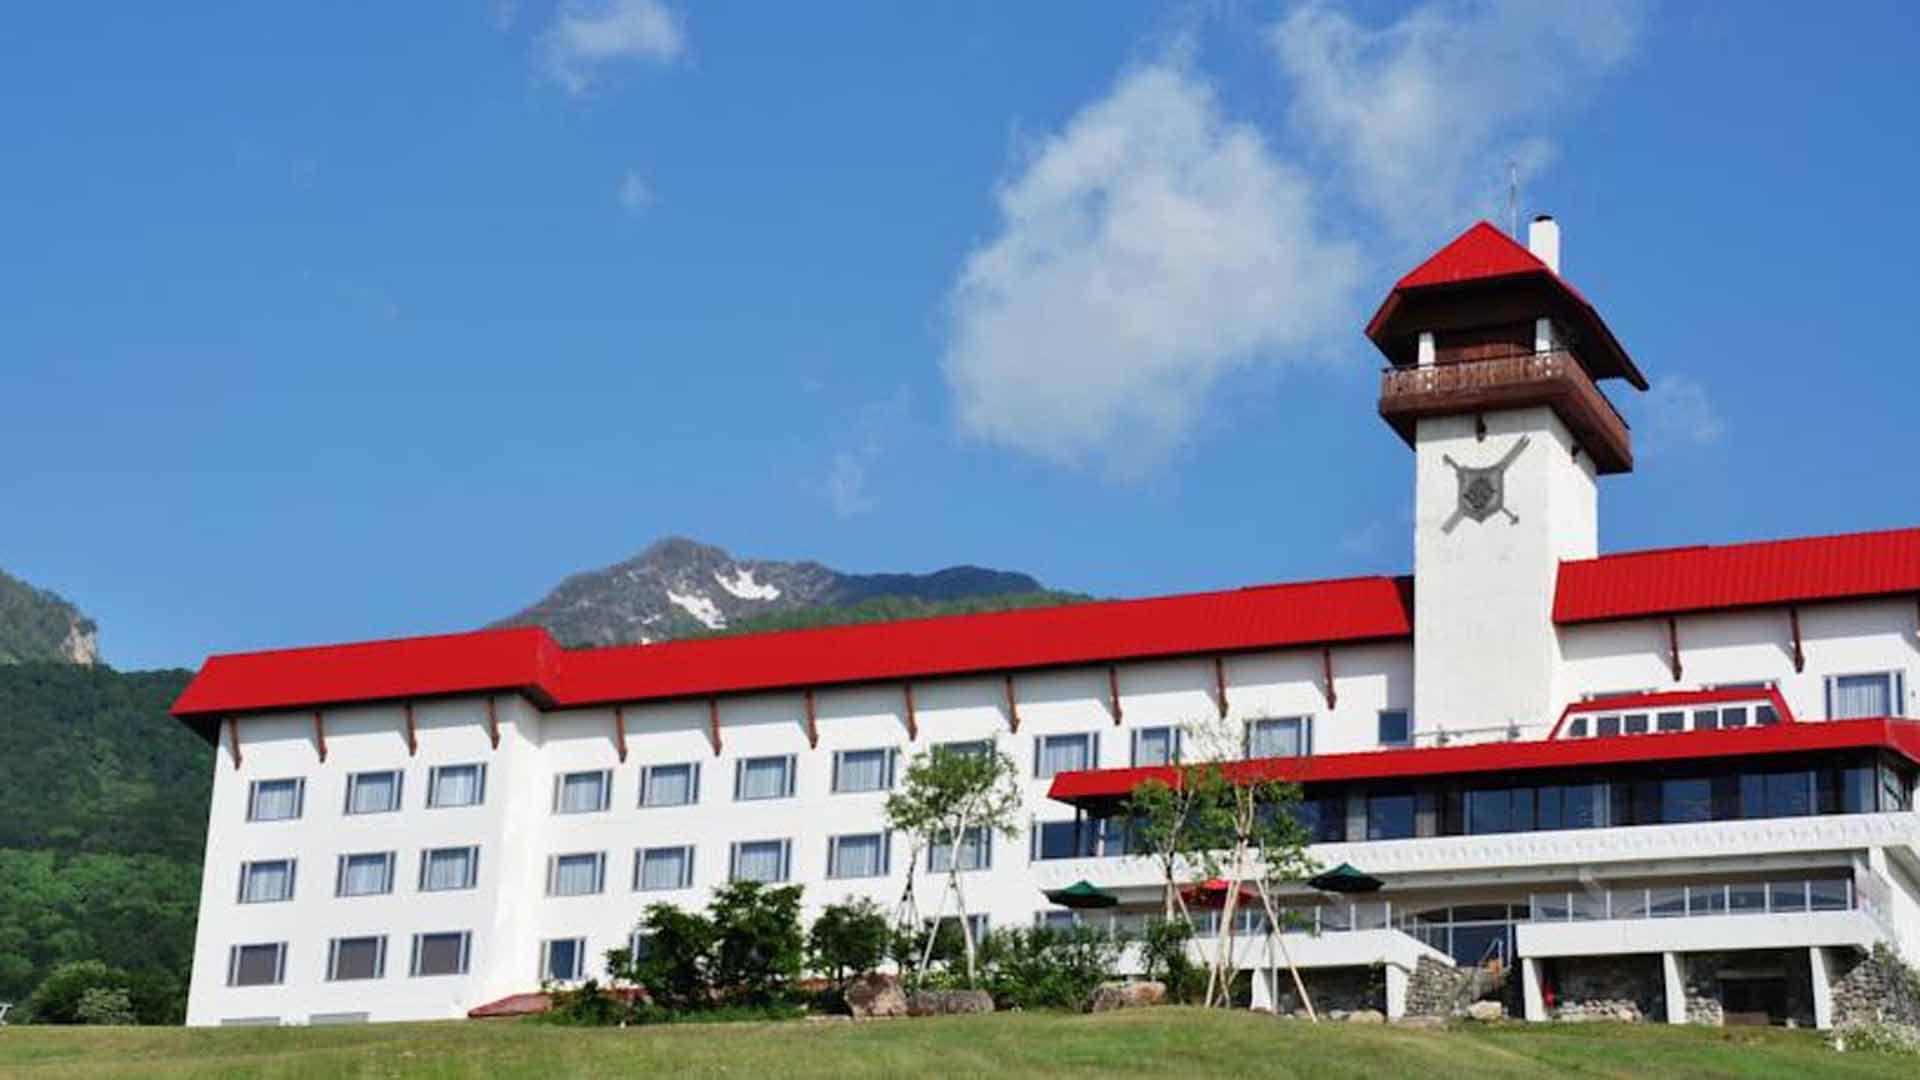 akakura-kanko-hotel-57b275e265ecd_large